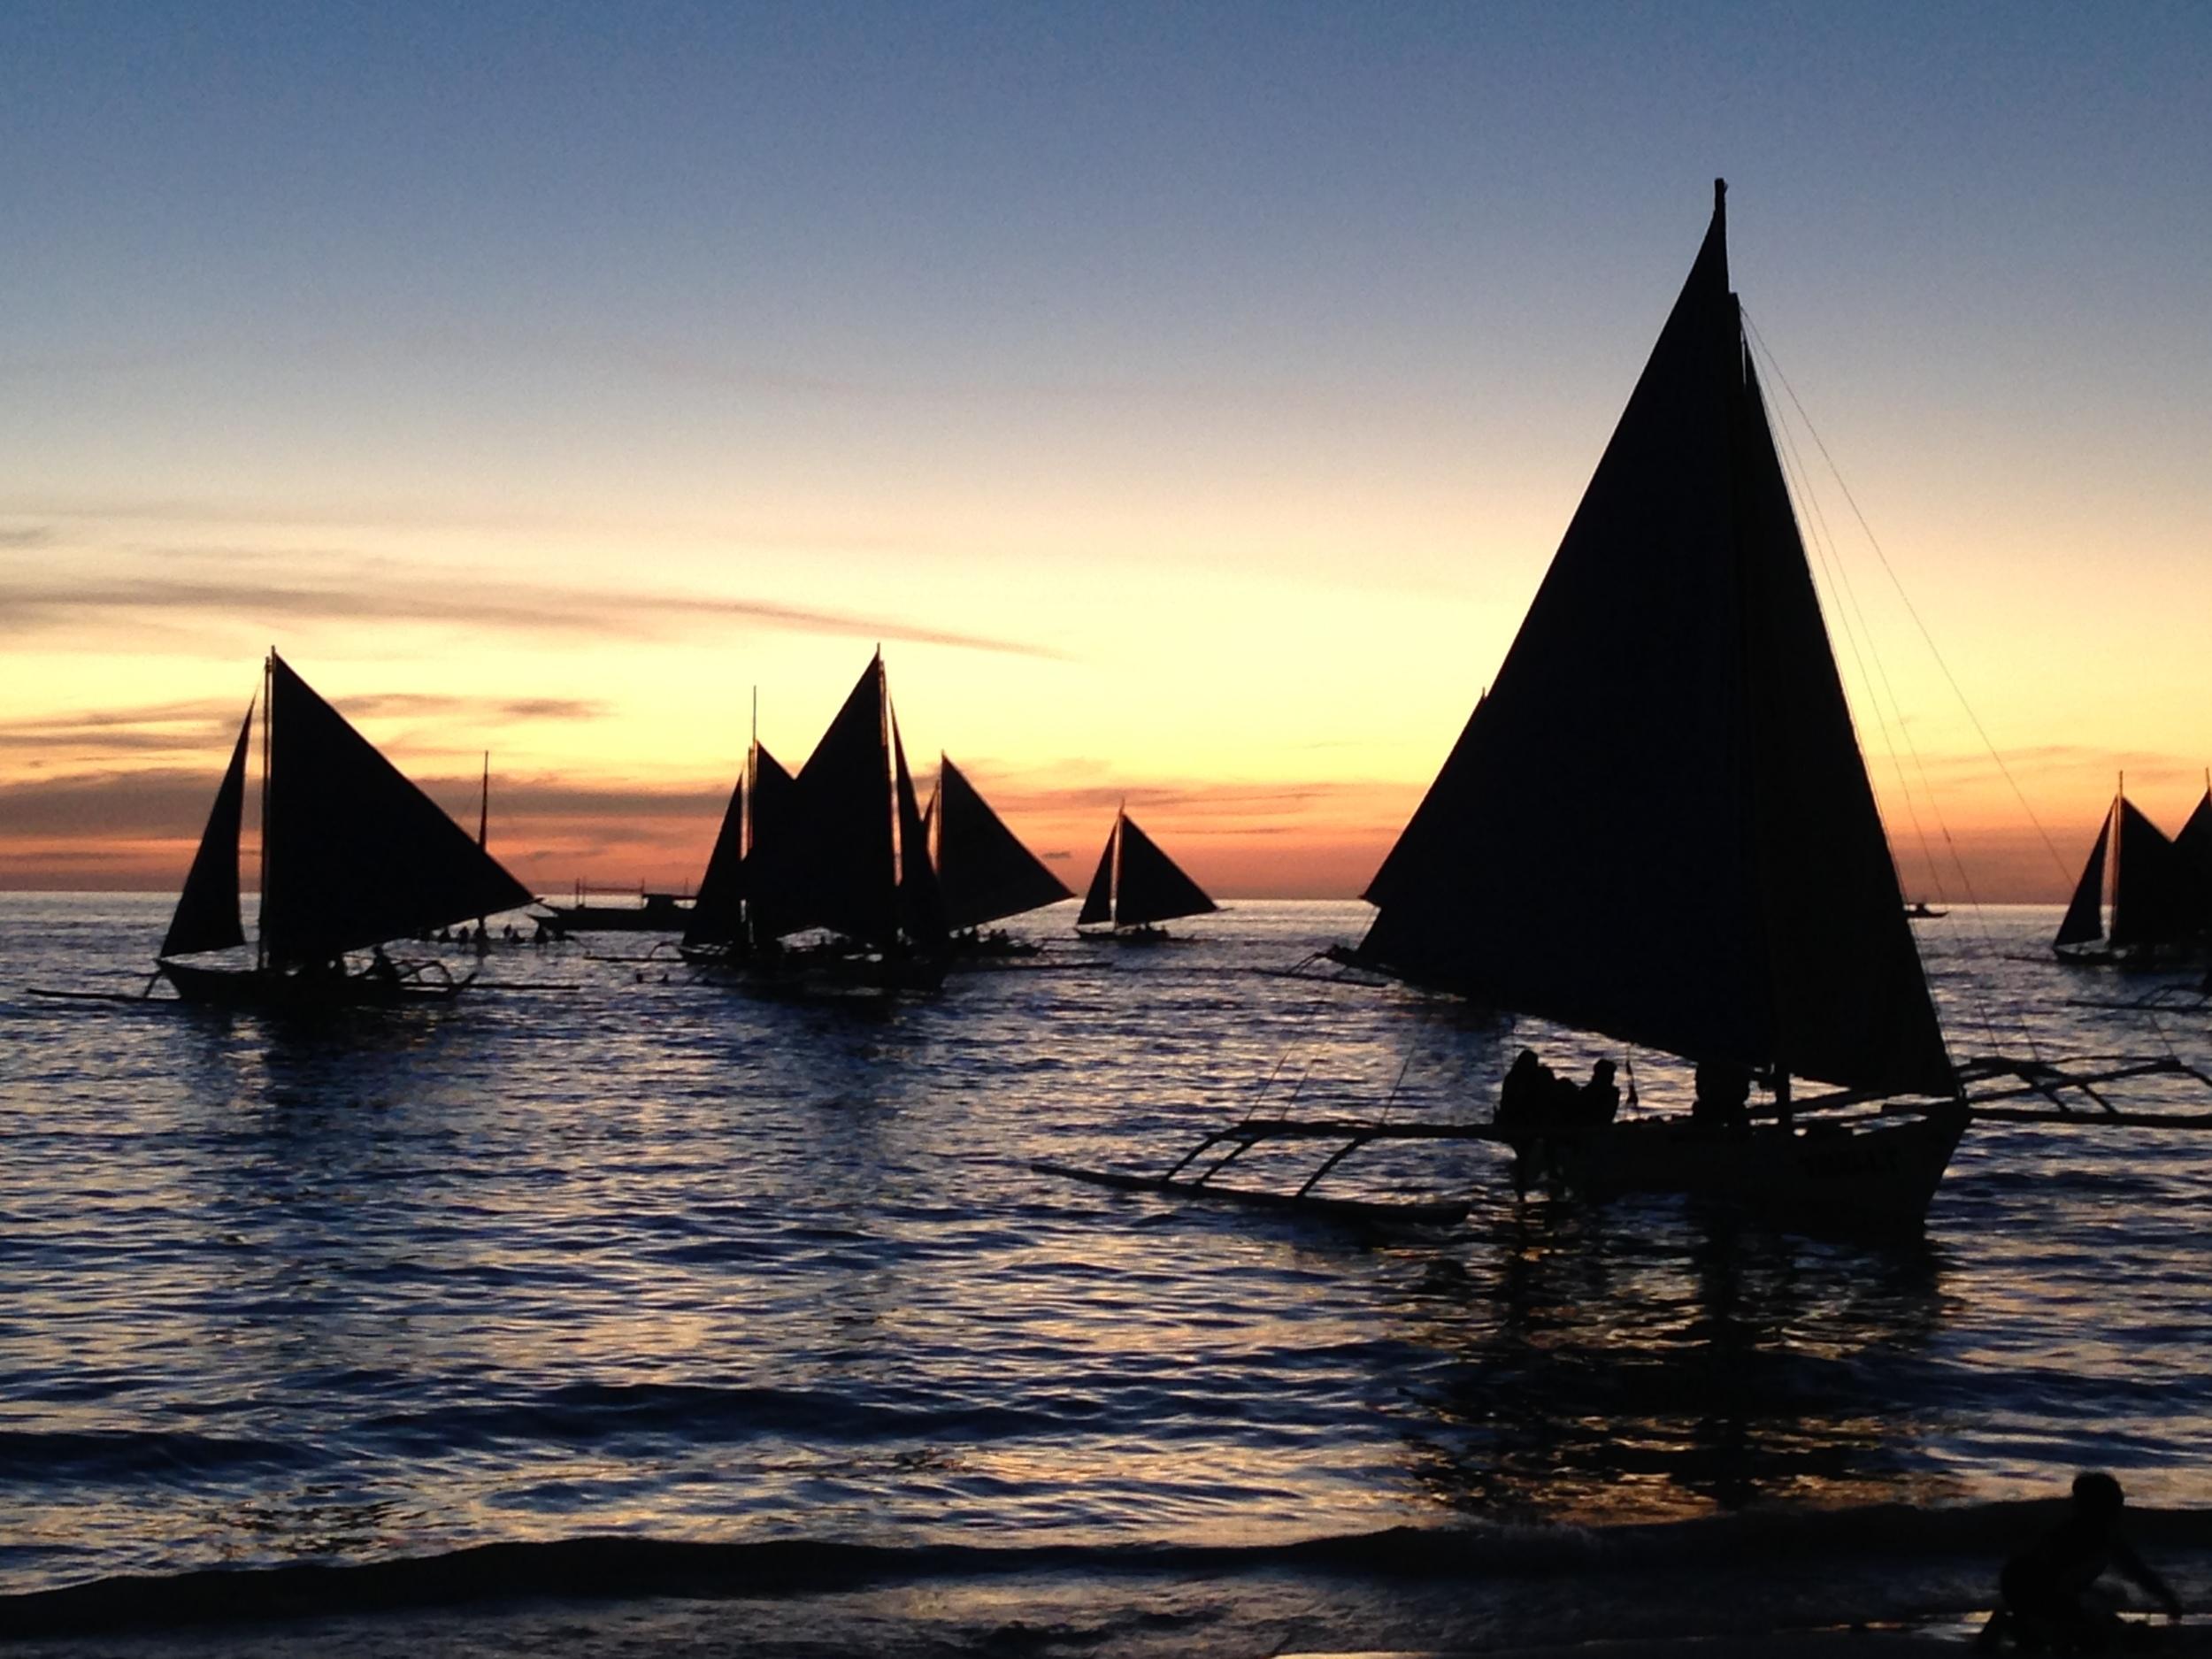 Philippines Entertainment Sailboats